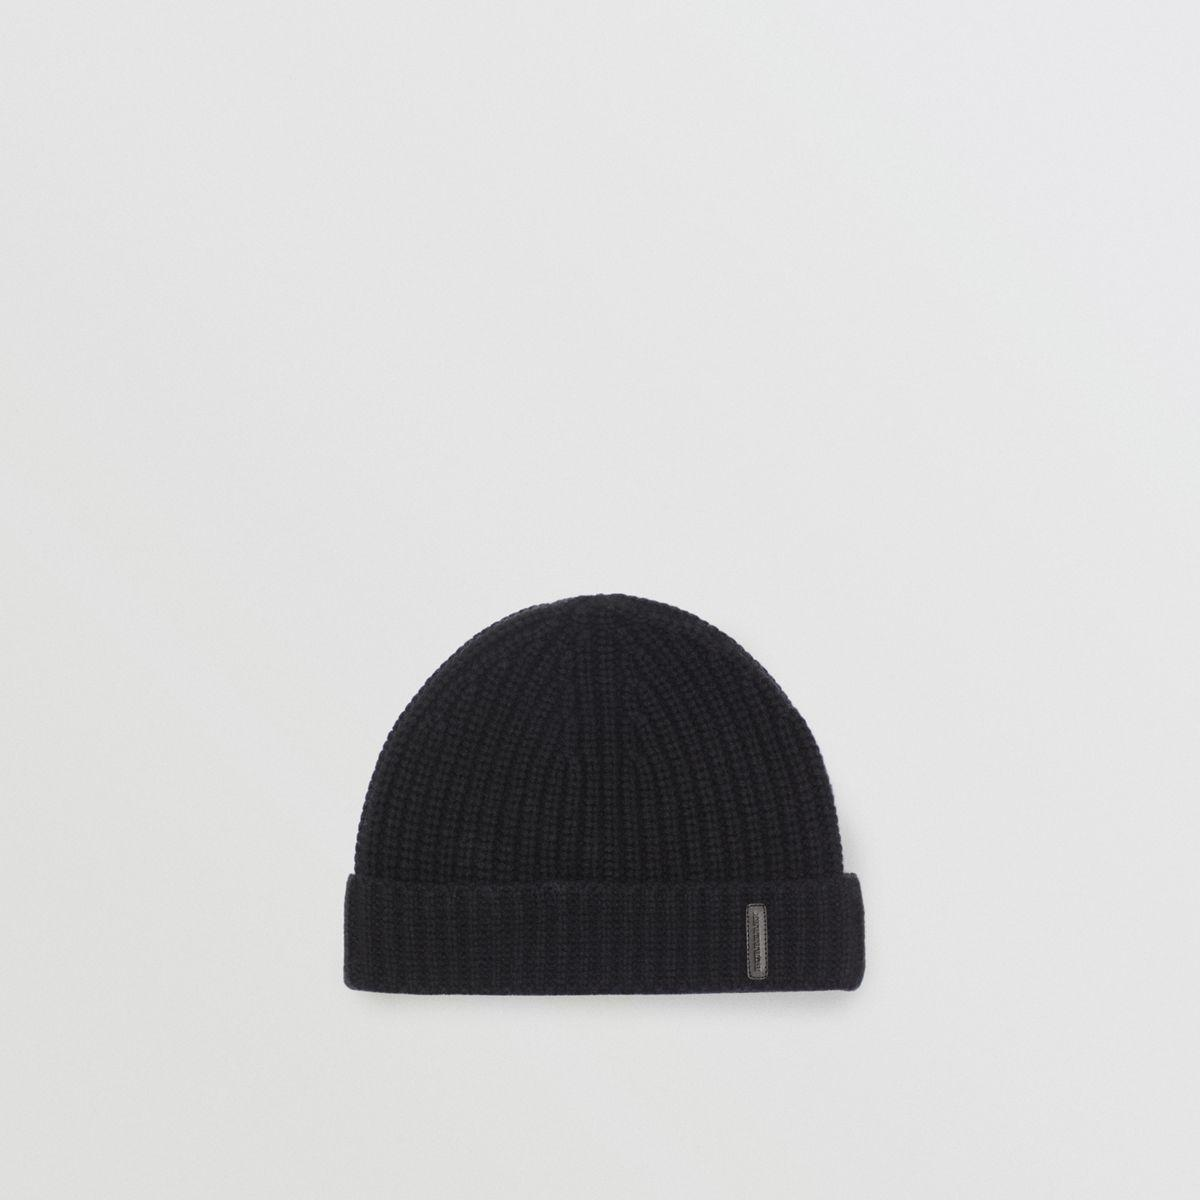 350ef749239b6 Burberry - Black Rib Knit Cashmere Beanie - Lyst. View fullscreen